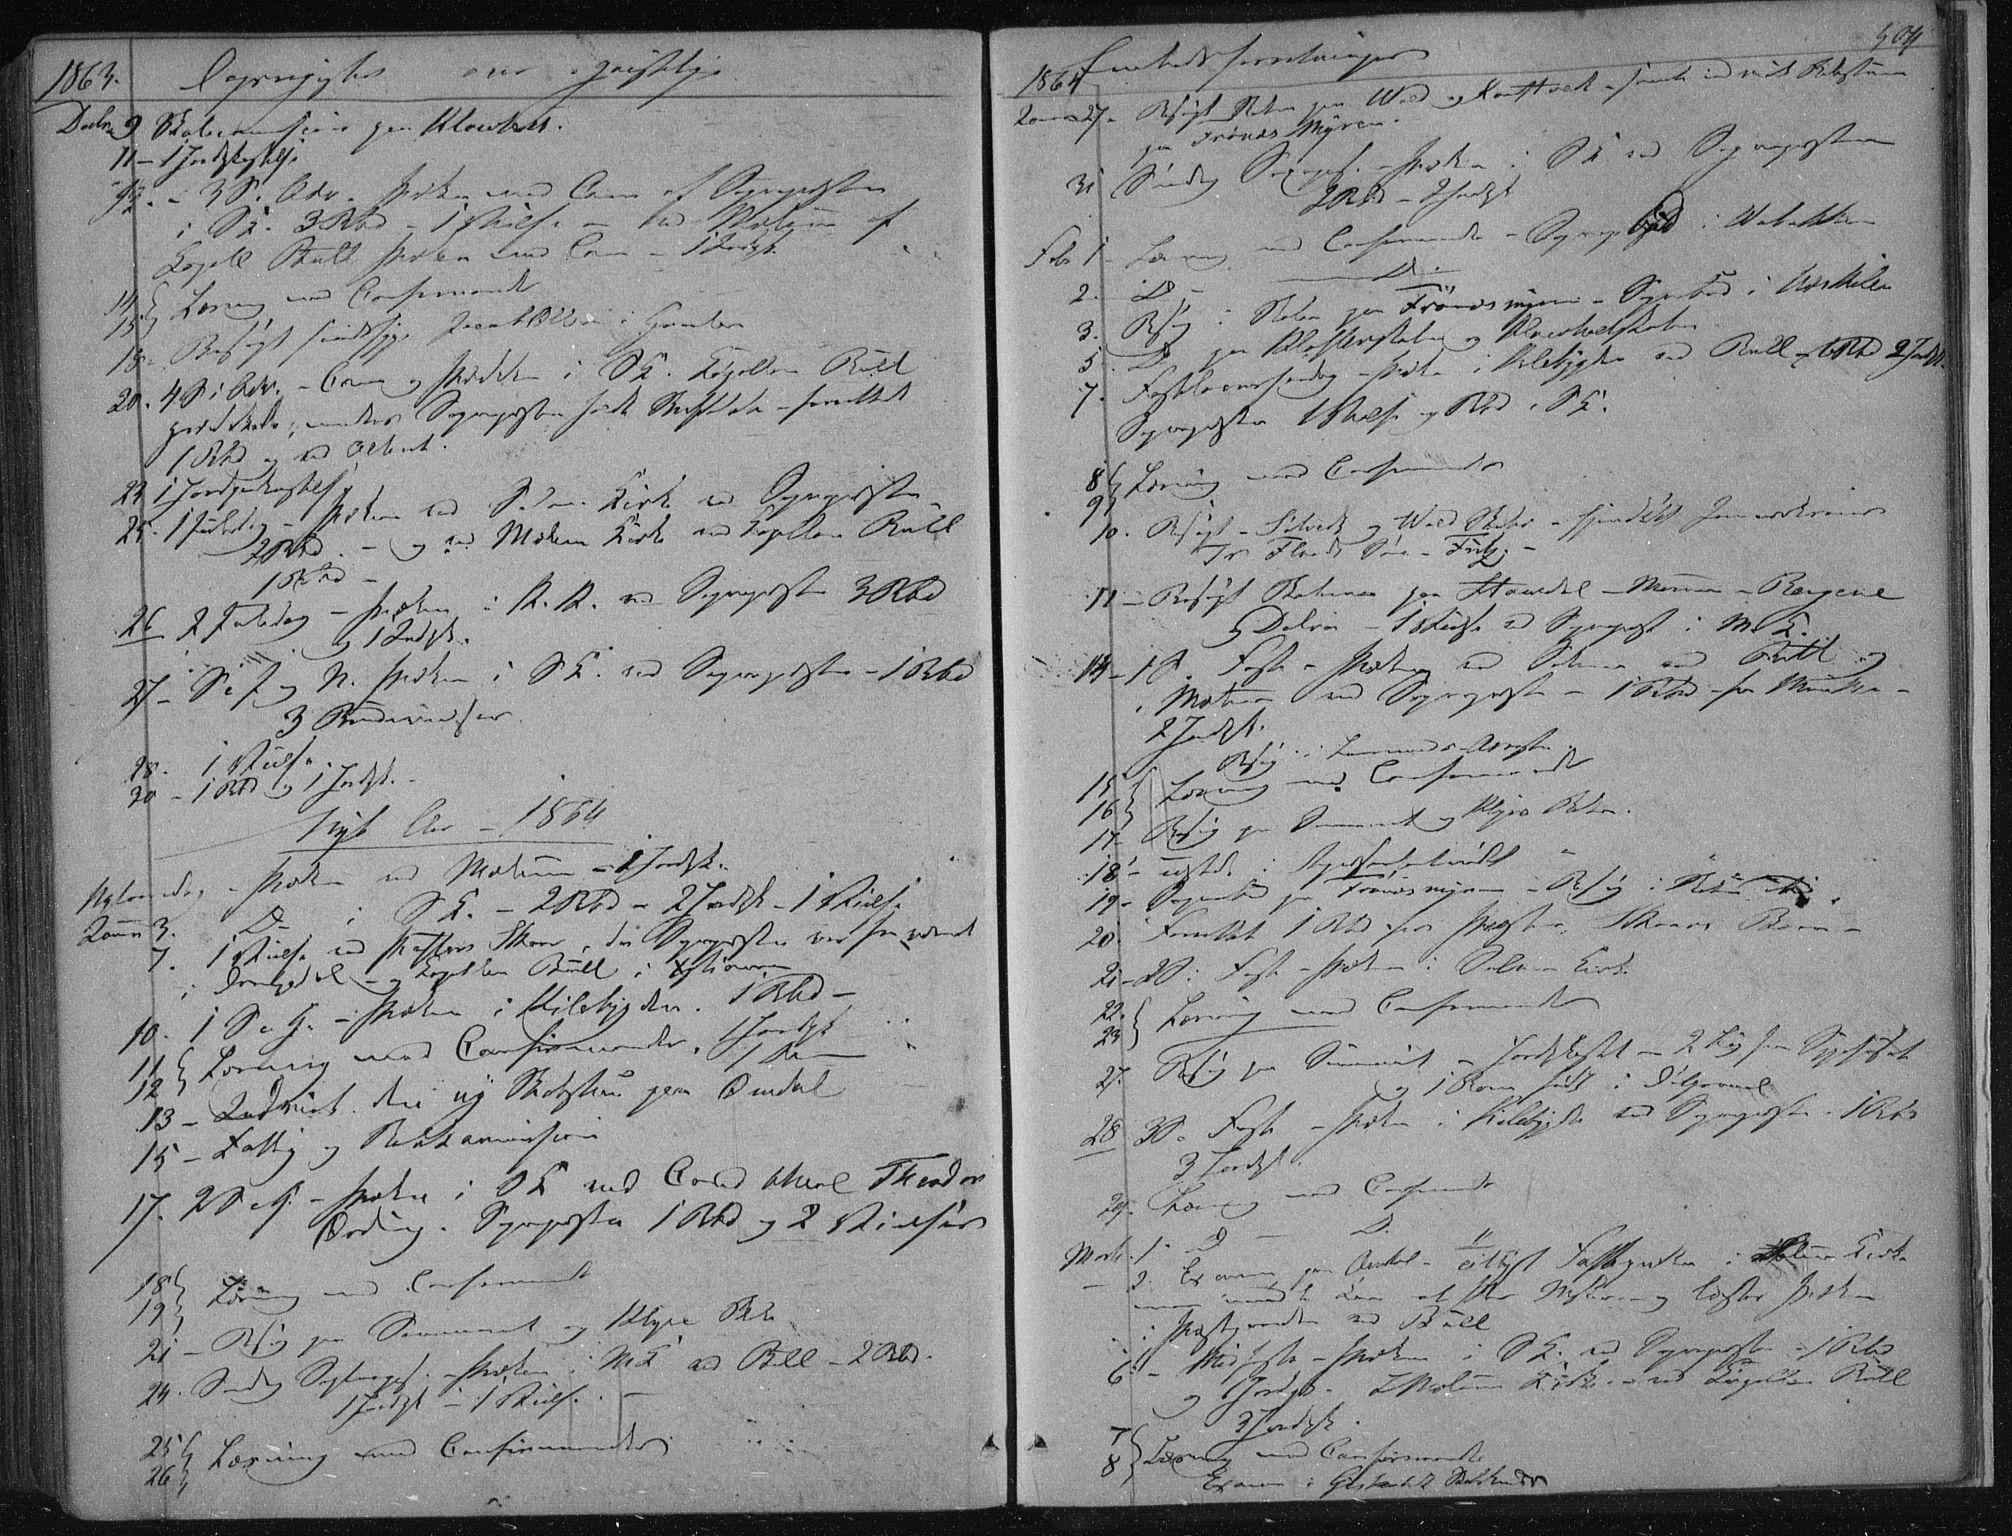 SAKO, Solum kirkebøker, F/Fa/L0007: Ministerialbok nr. I 7, 1856-1864, s. 504